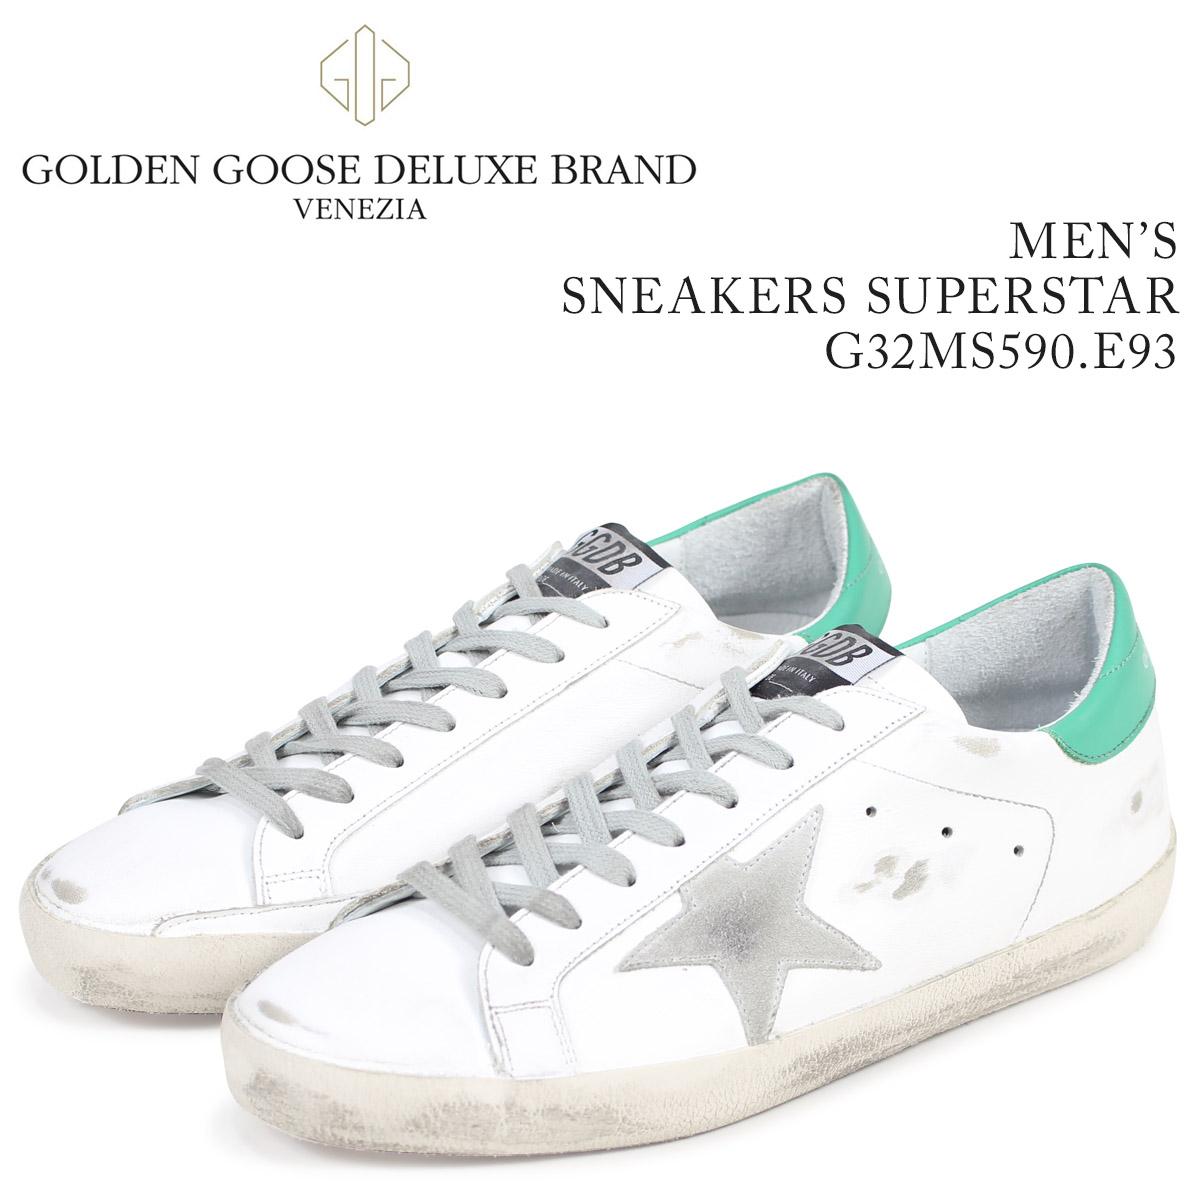 Golden Goose ゴールデングース スニーカー メンズ スーパースター SNEAKERS SUPERSTAR ホワイト G32MS590 E93